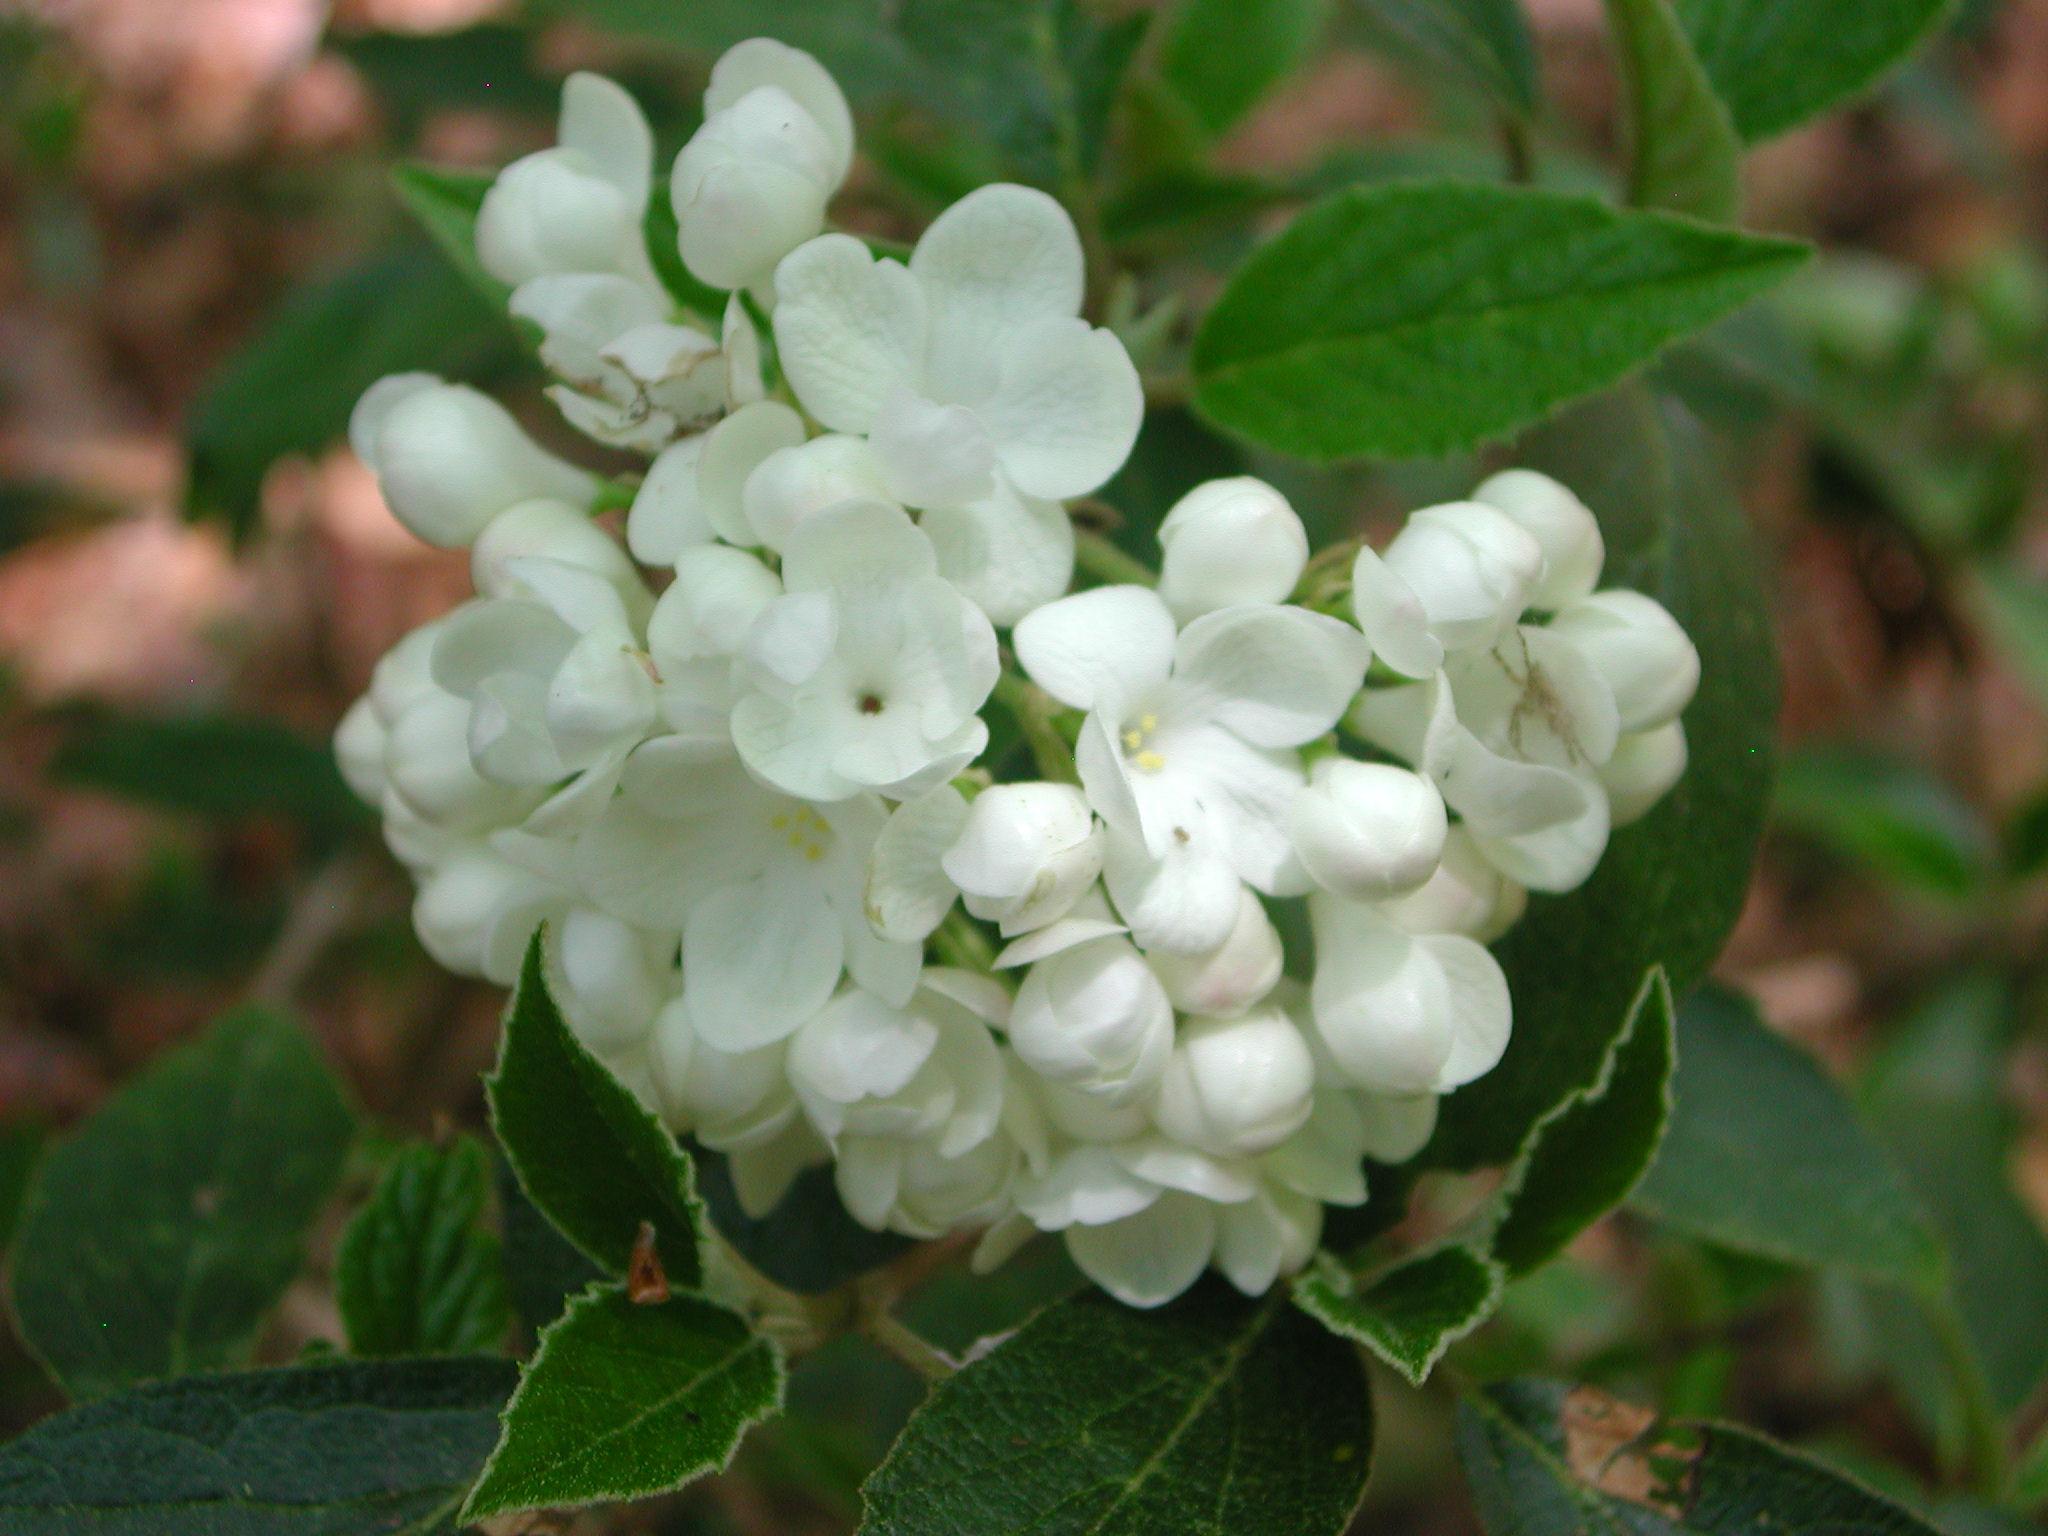 White Flowers Of Service Viburnum Nature Photo Gallery